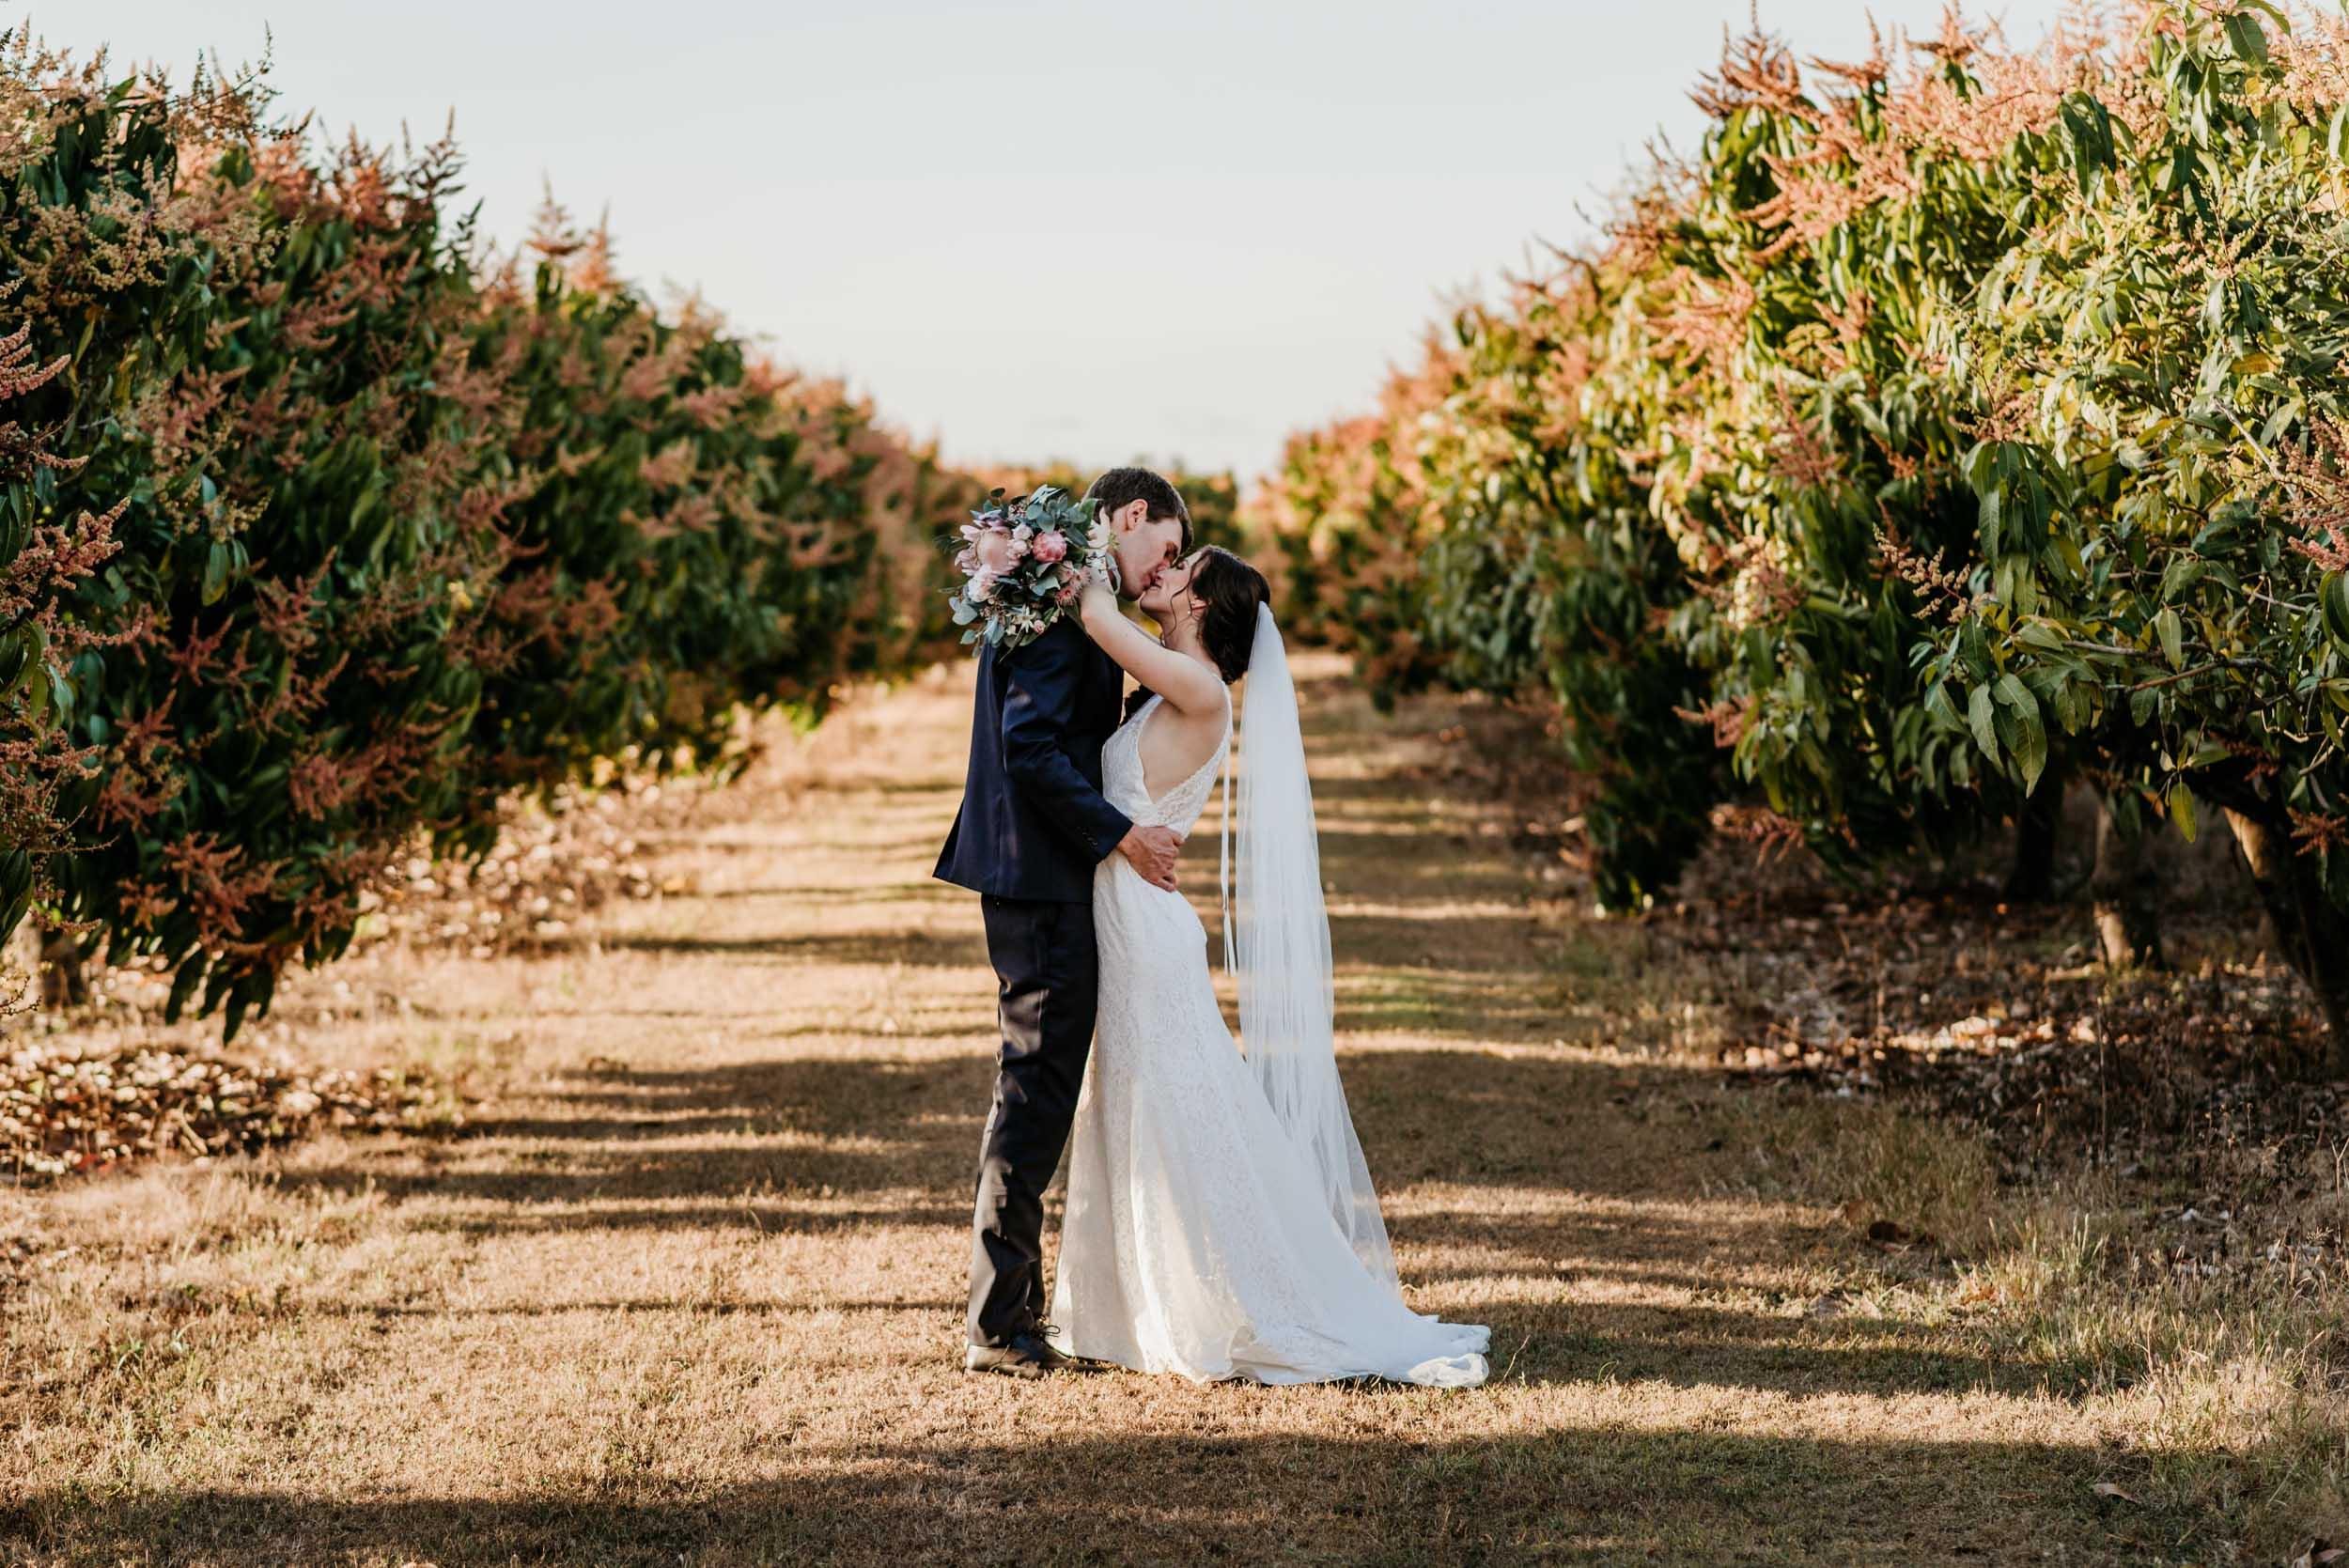 The Raw Photographer - Cairns Wedding Photographer - Atherton Tablelands Venue - Mareeba Photography-47.jpg